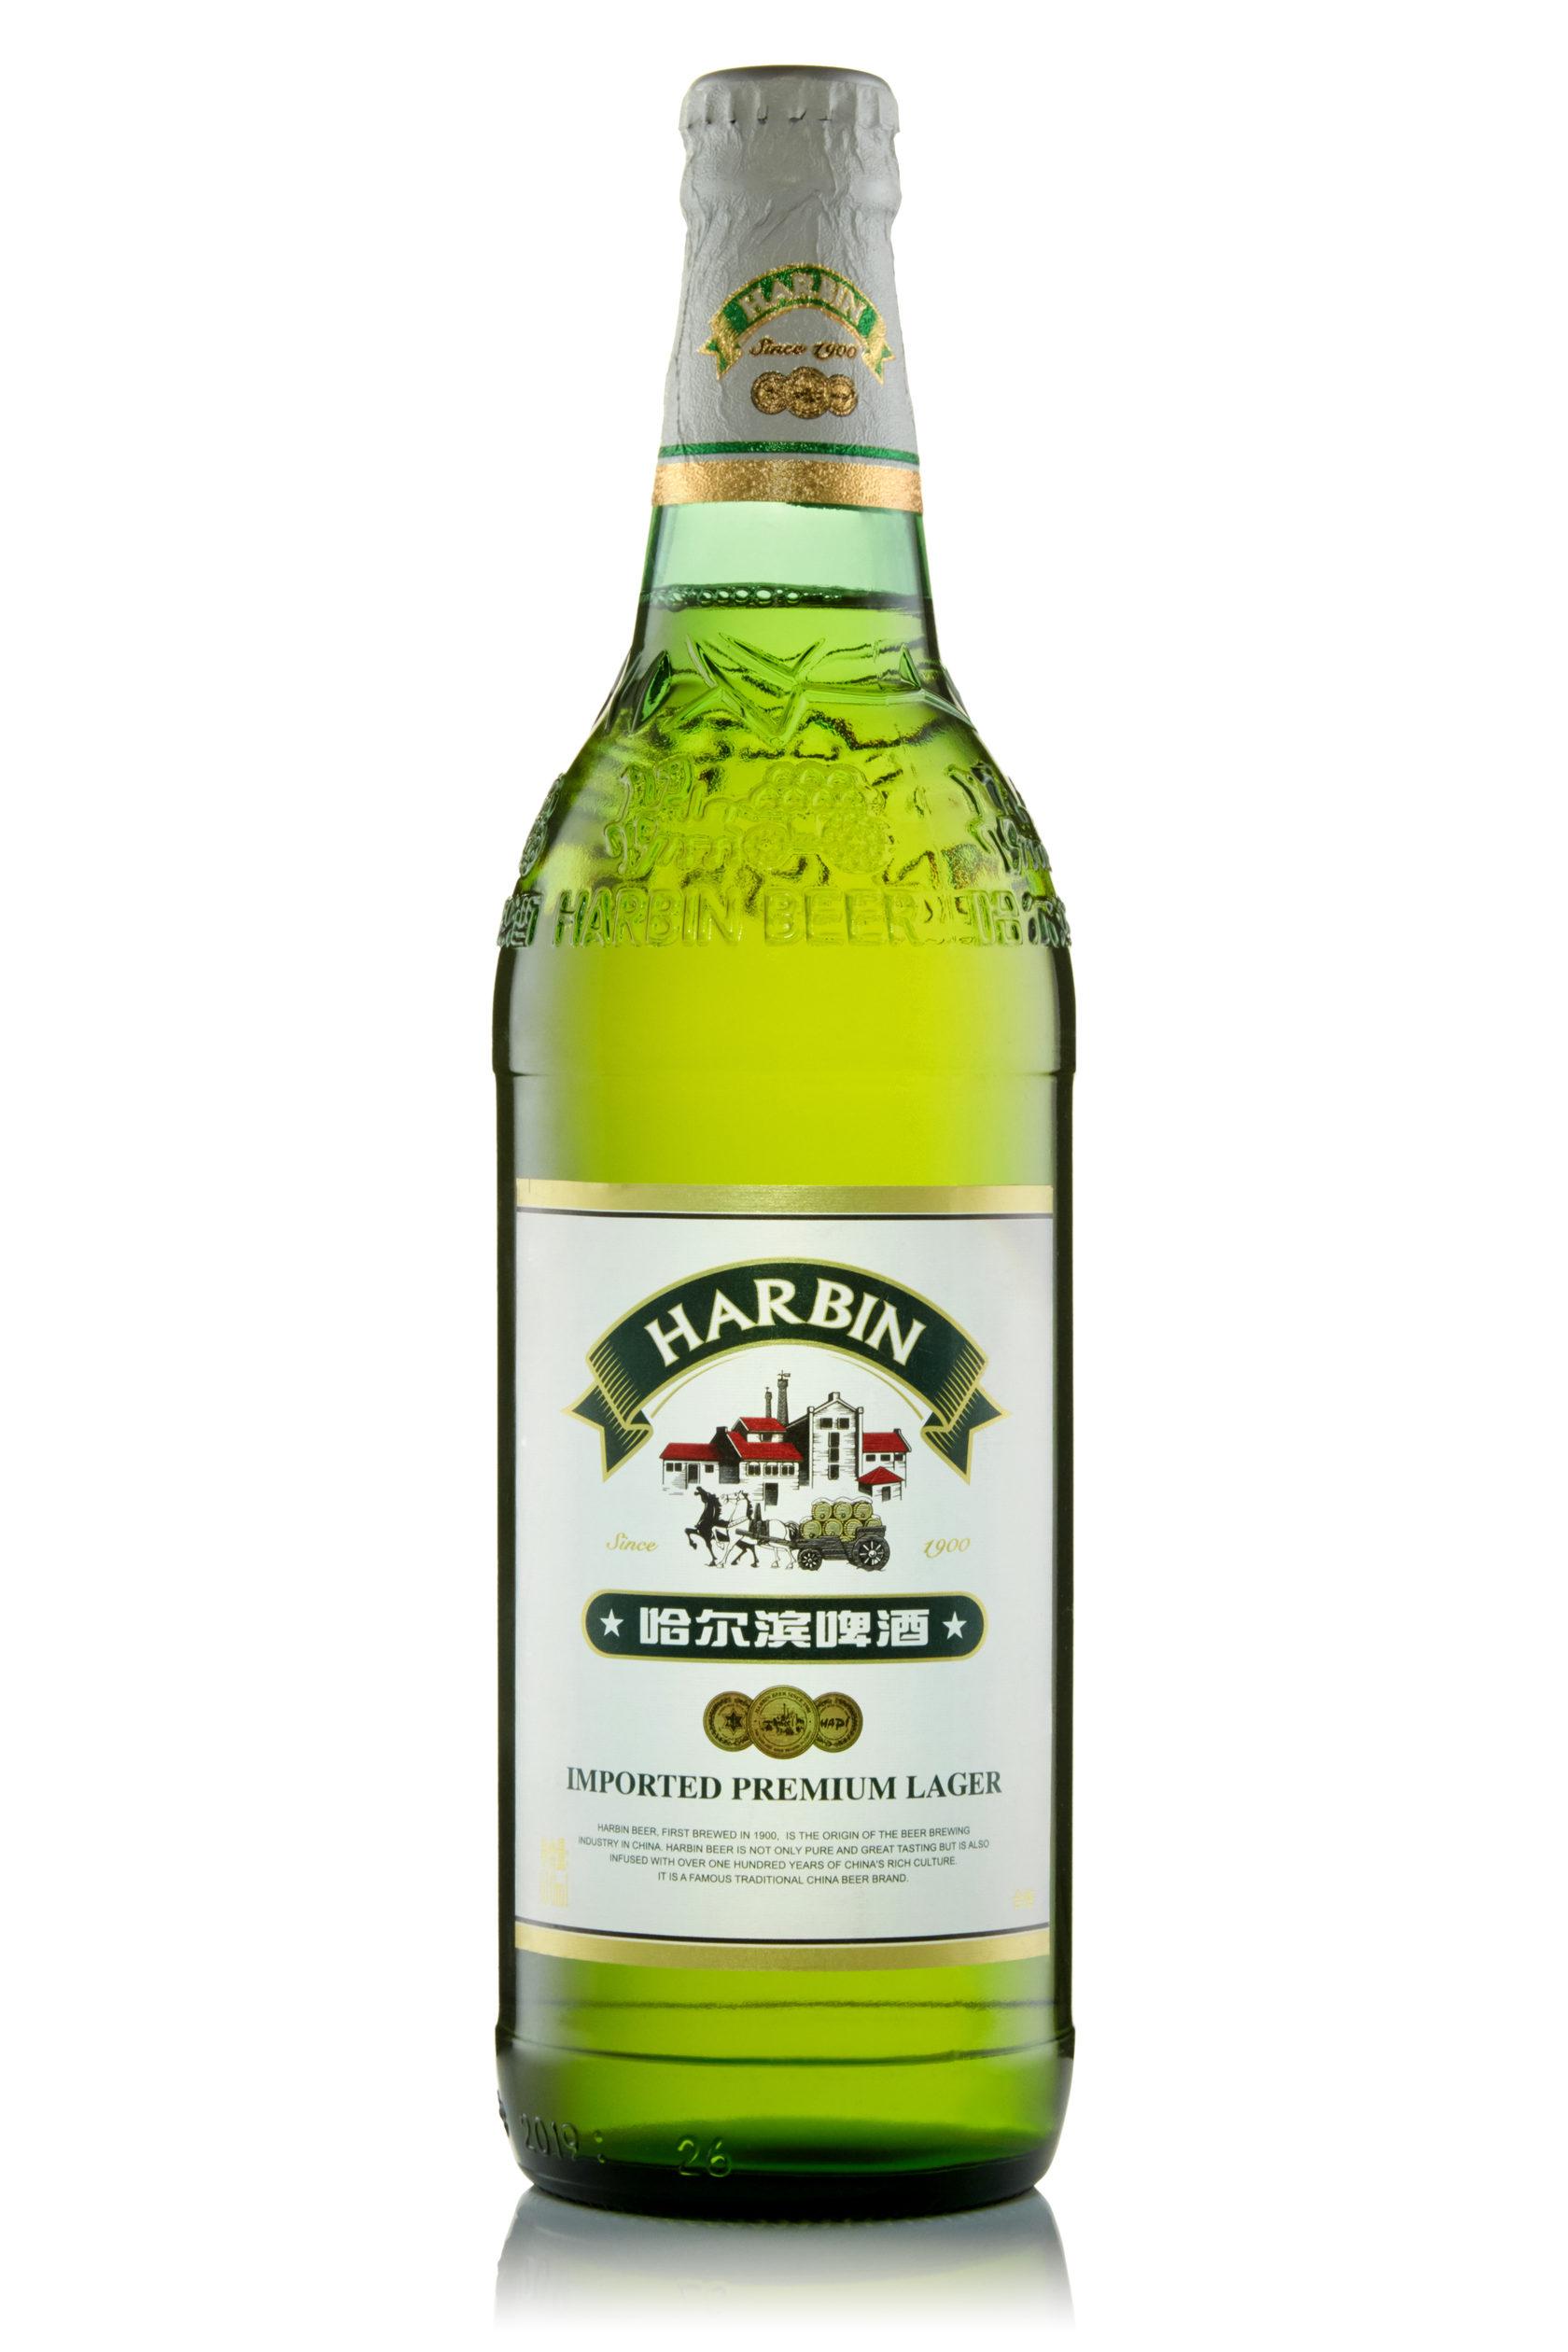 Купить пиво оптом Харбин Премиум 610 мл ст/б